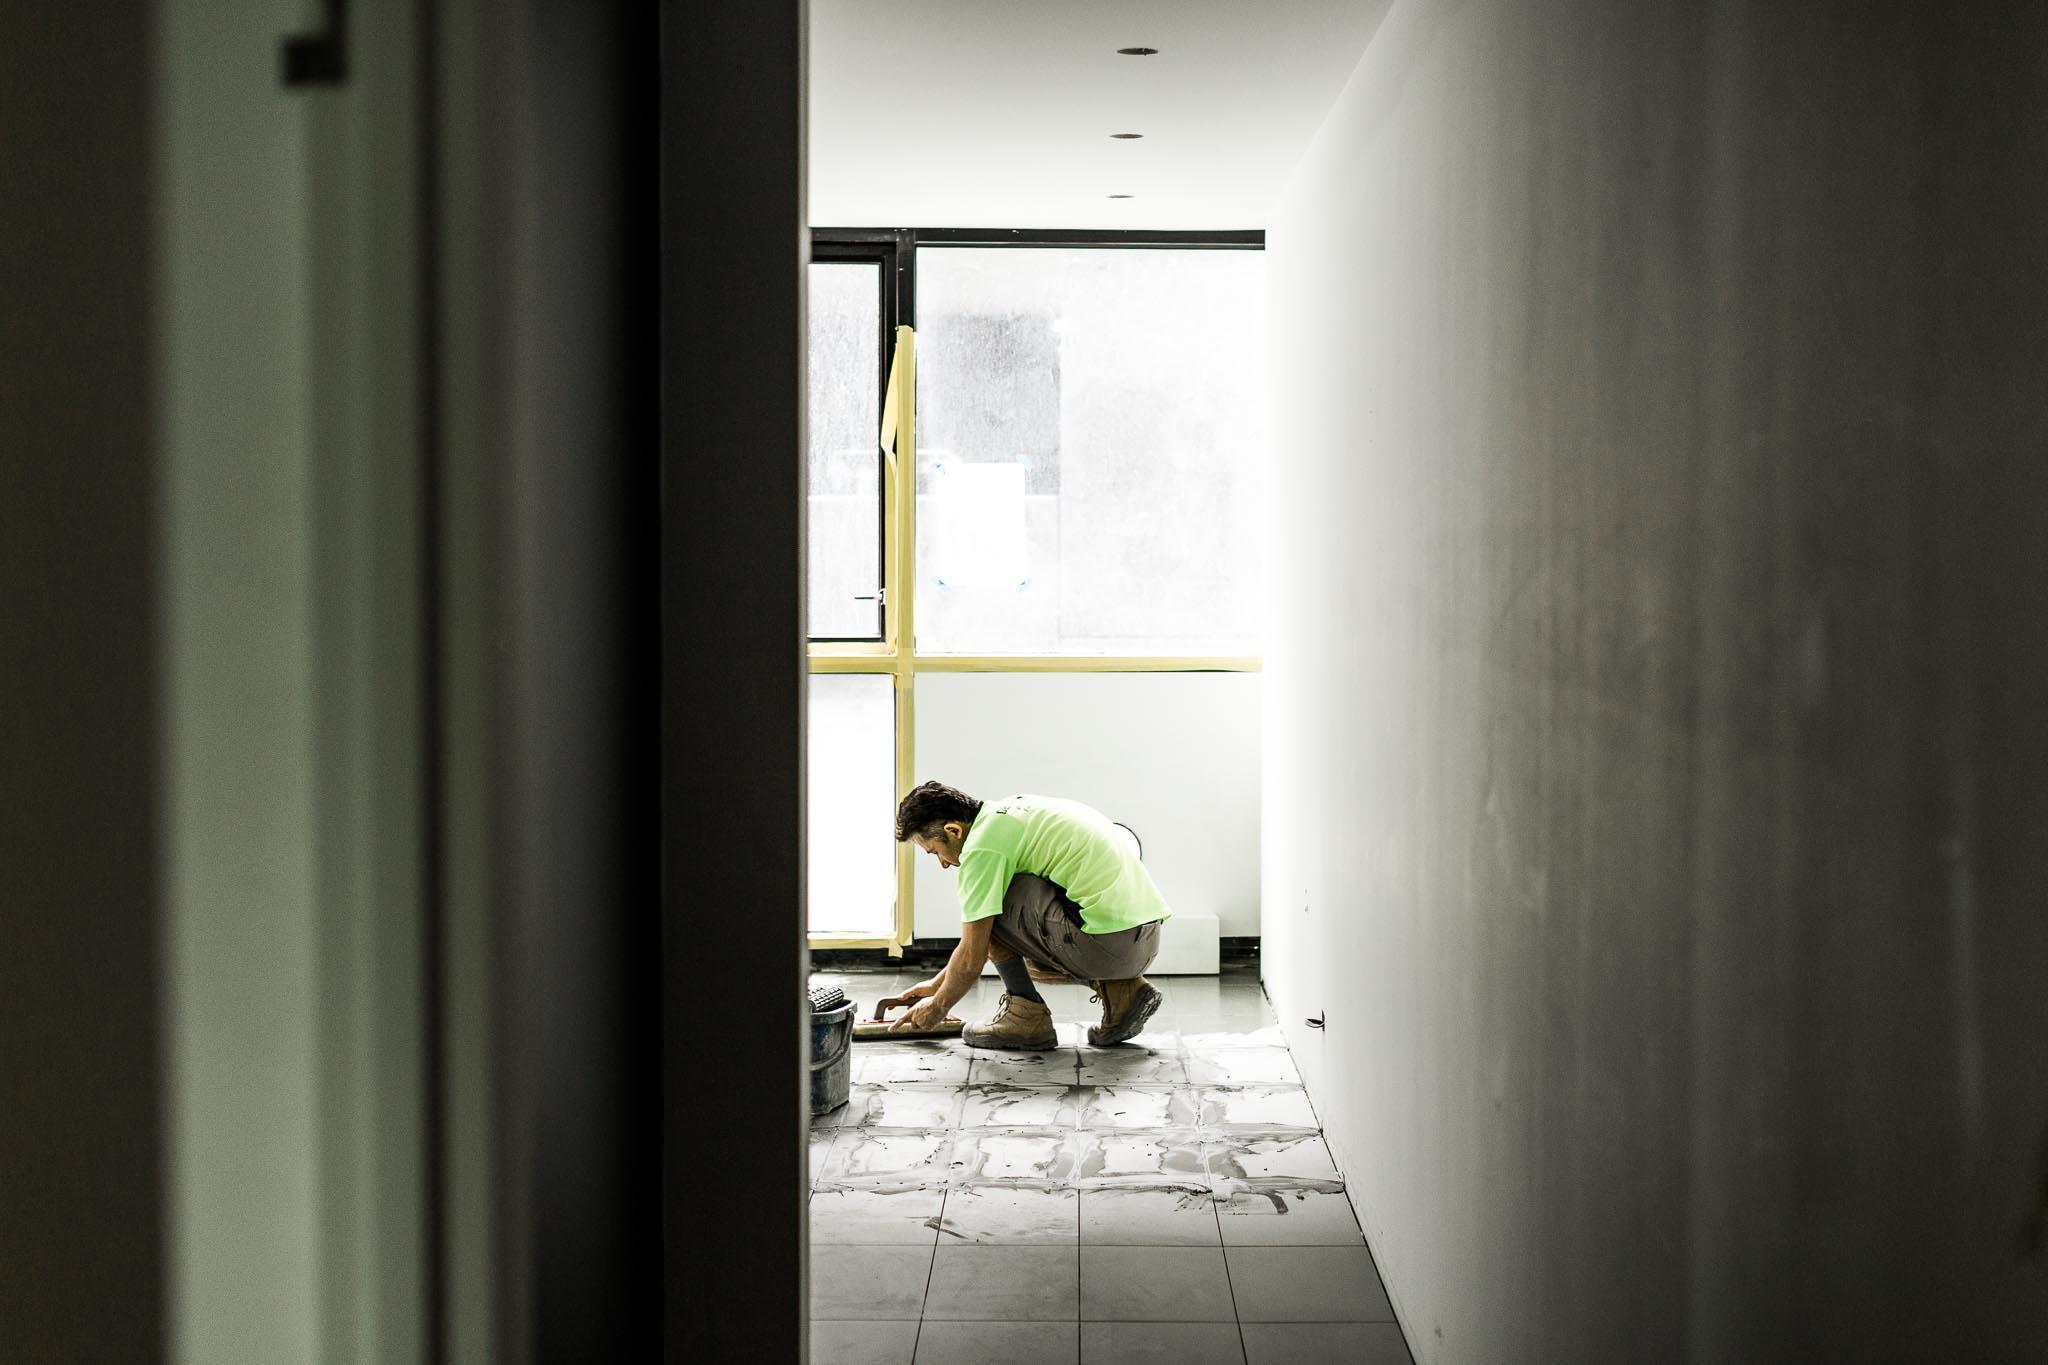 Architecture-photographer-560-Flinders-Under-Construction